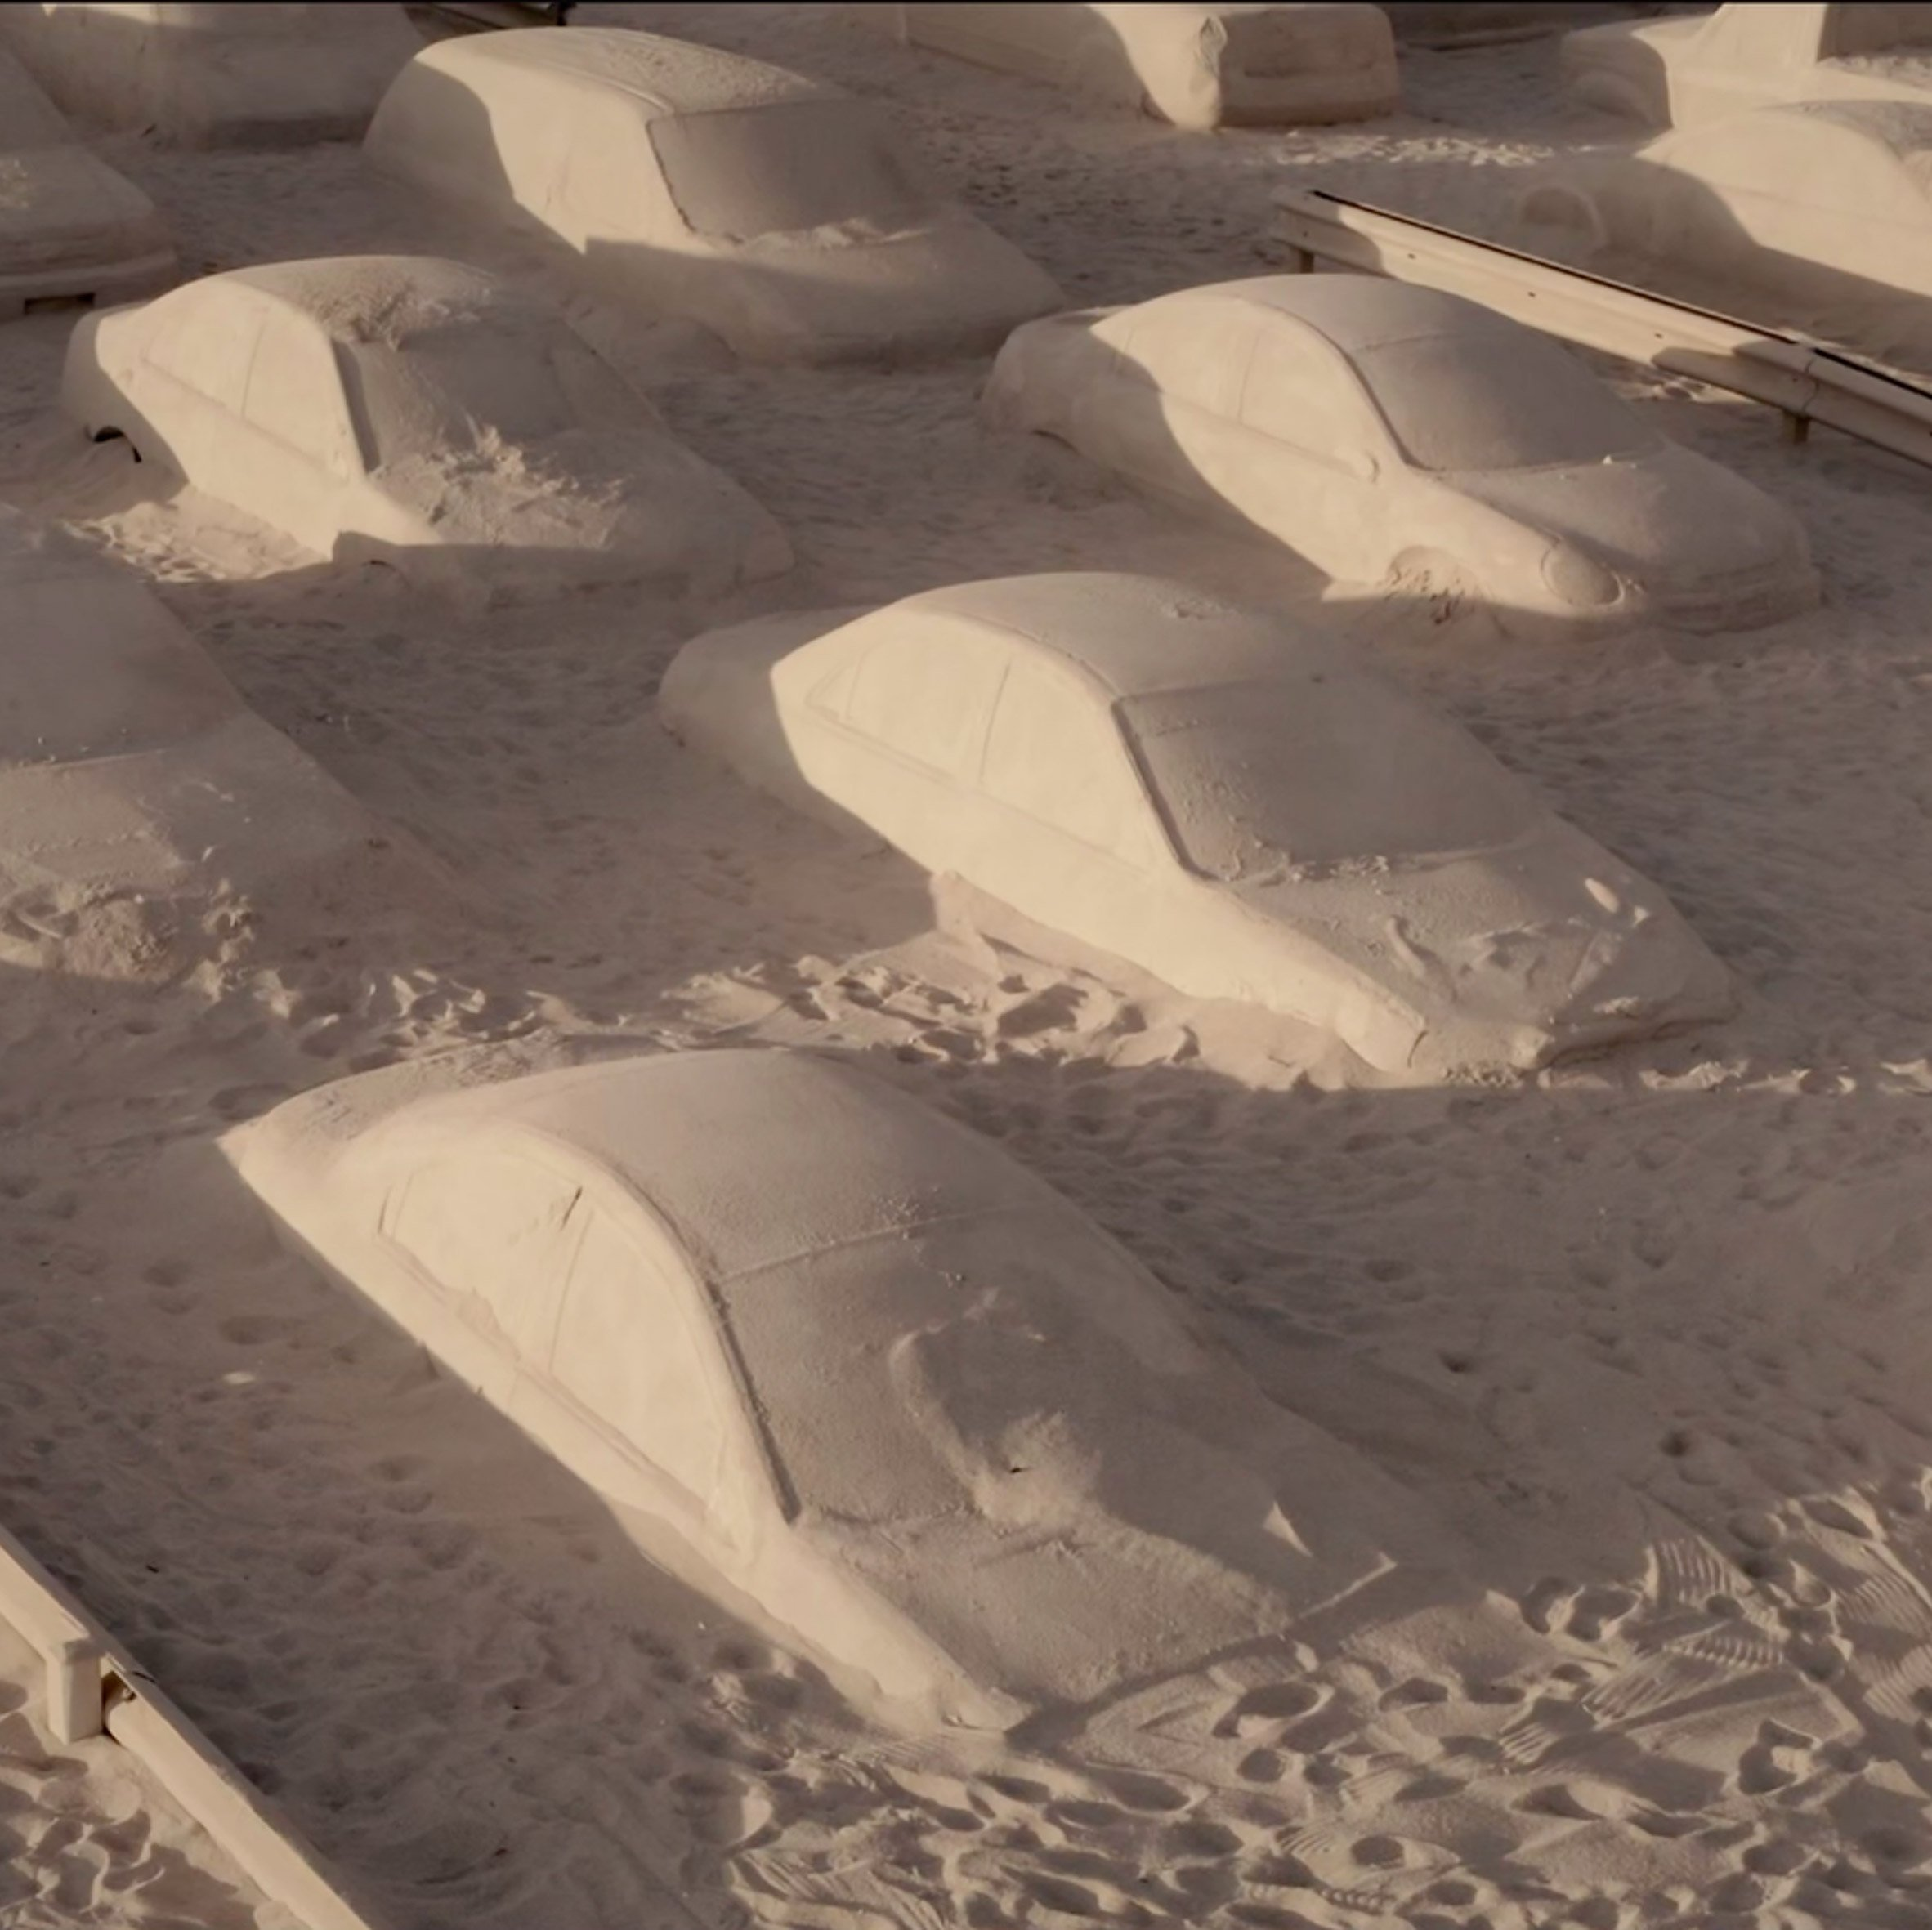 Artist Leandro Erlich creates sand-covered traffic jam on Miami beach